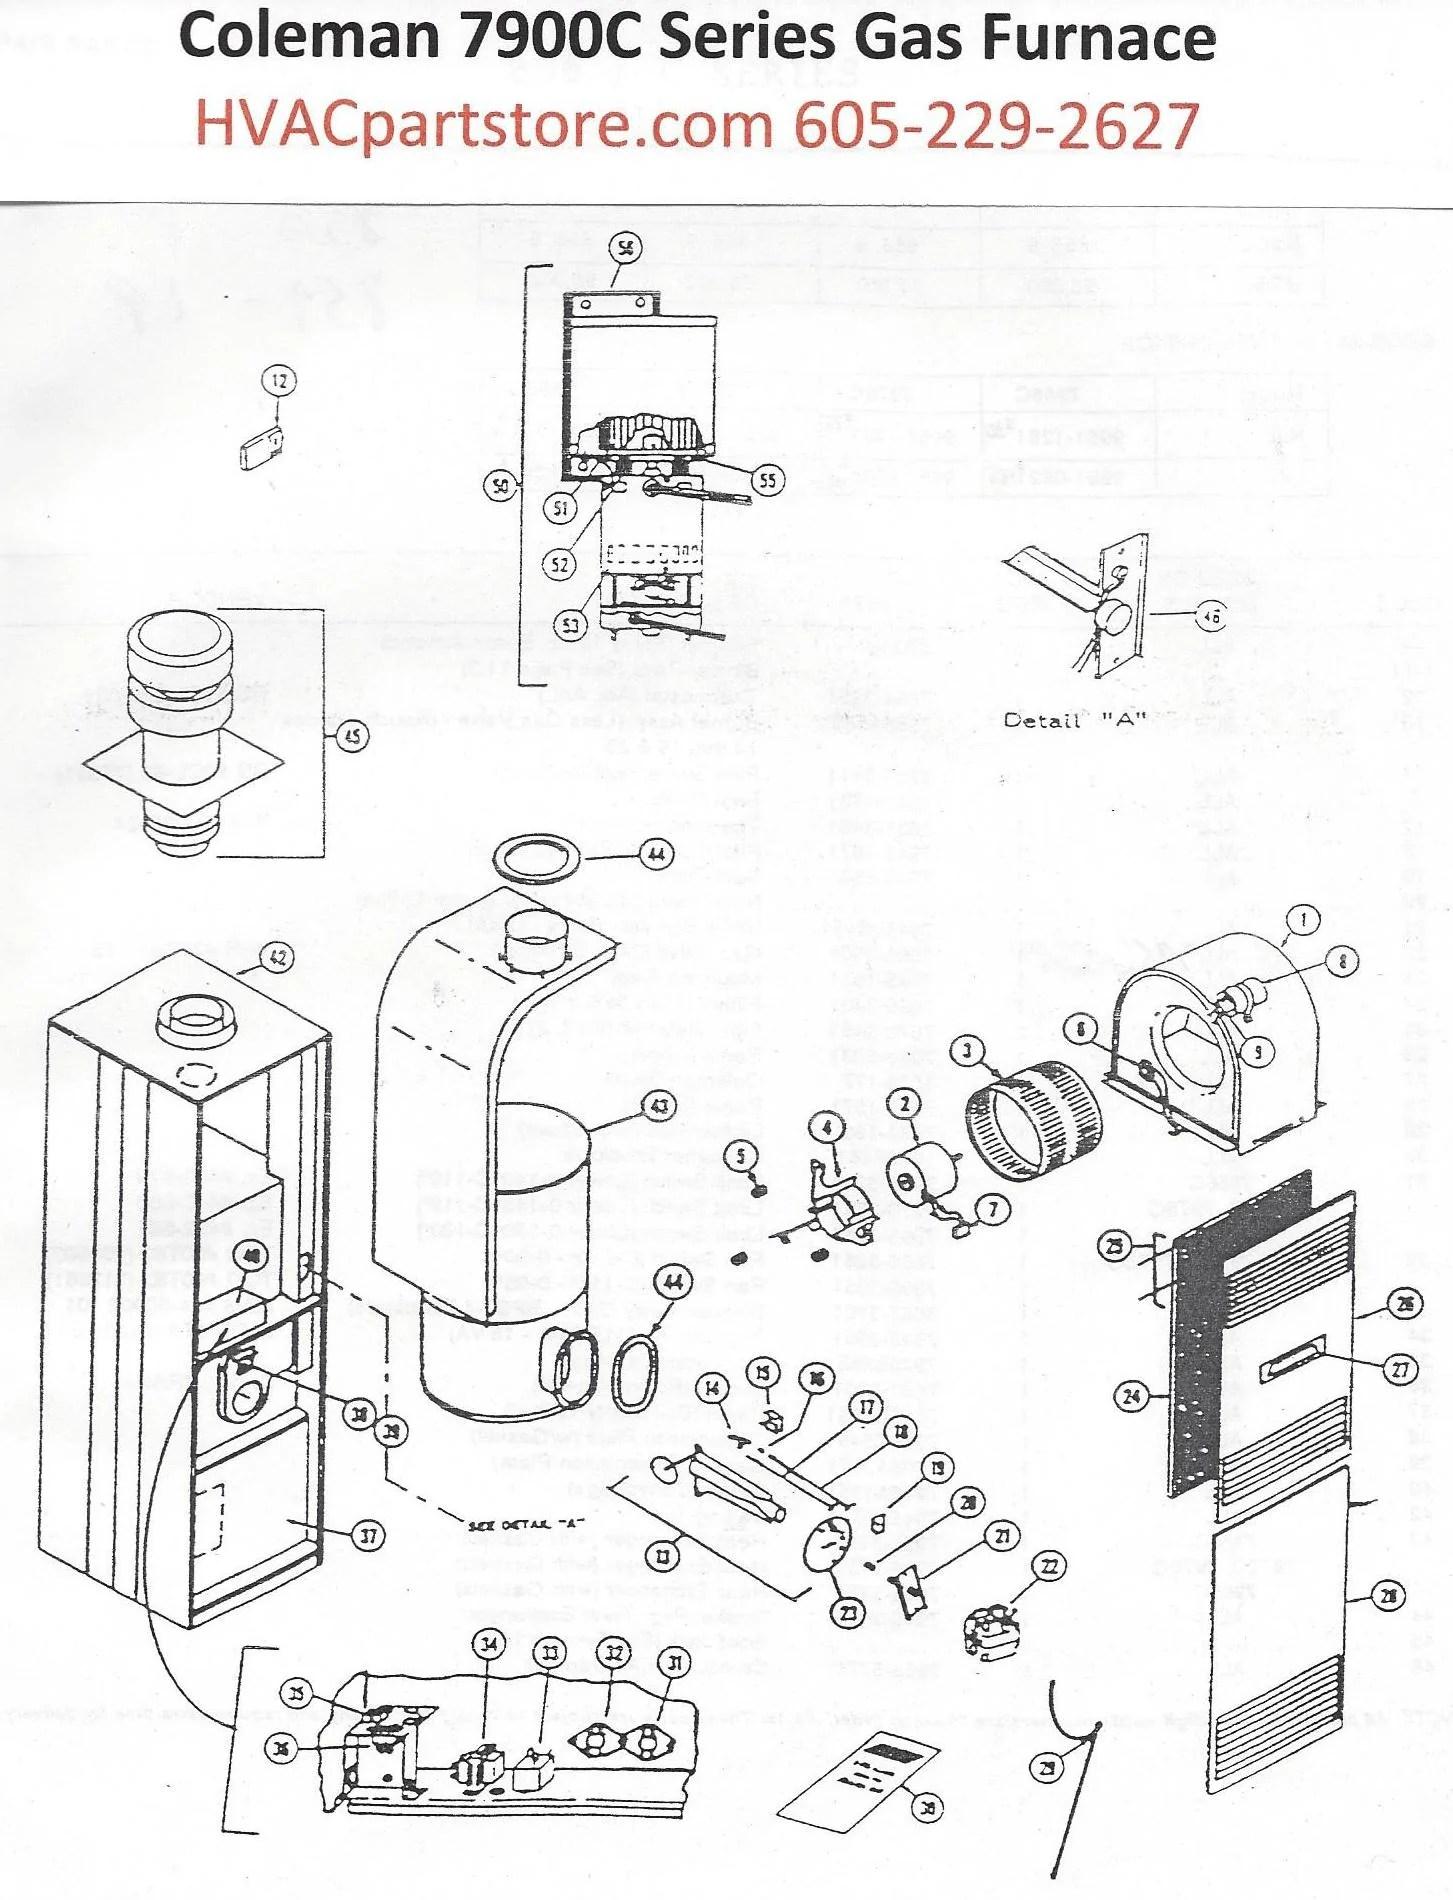 hight resolution of coleman furnace schematics wiring diagram schematics coleman furnace 7970 656 schematic 7970c856 coleman gas furnace